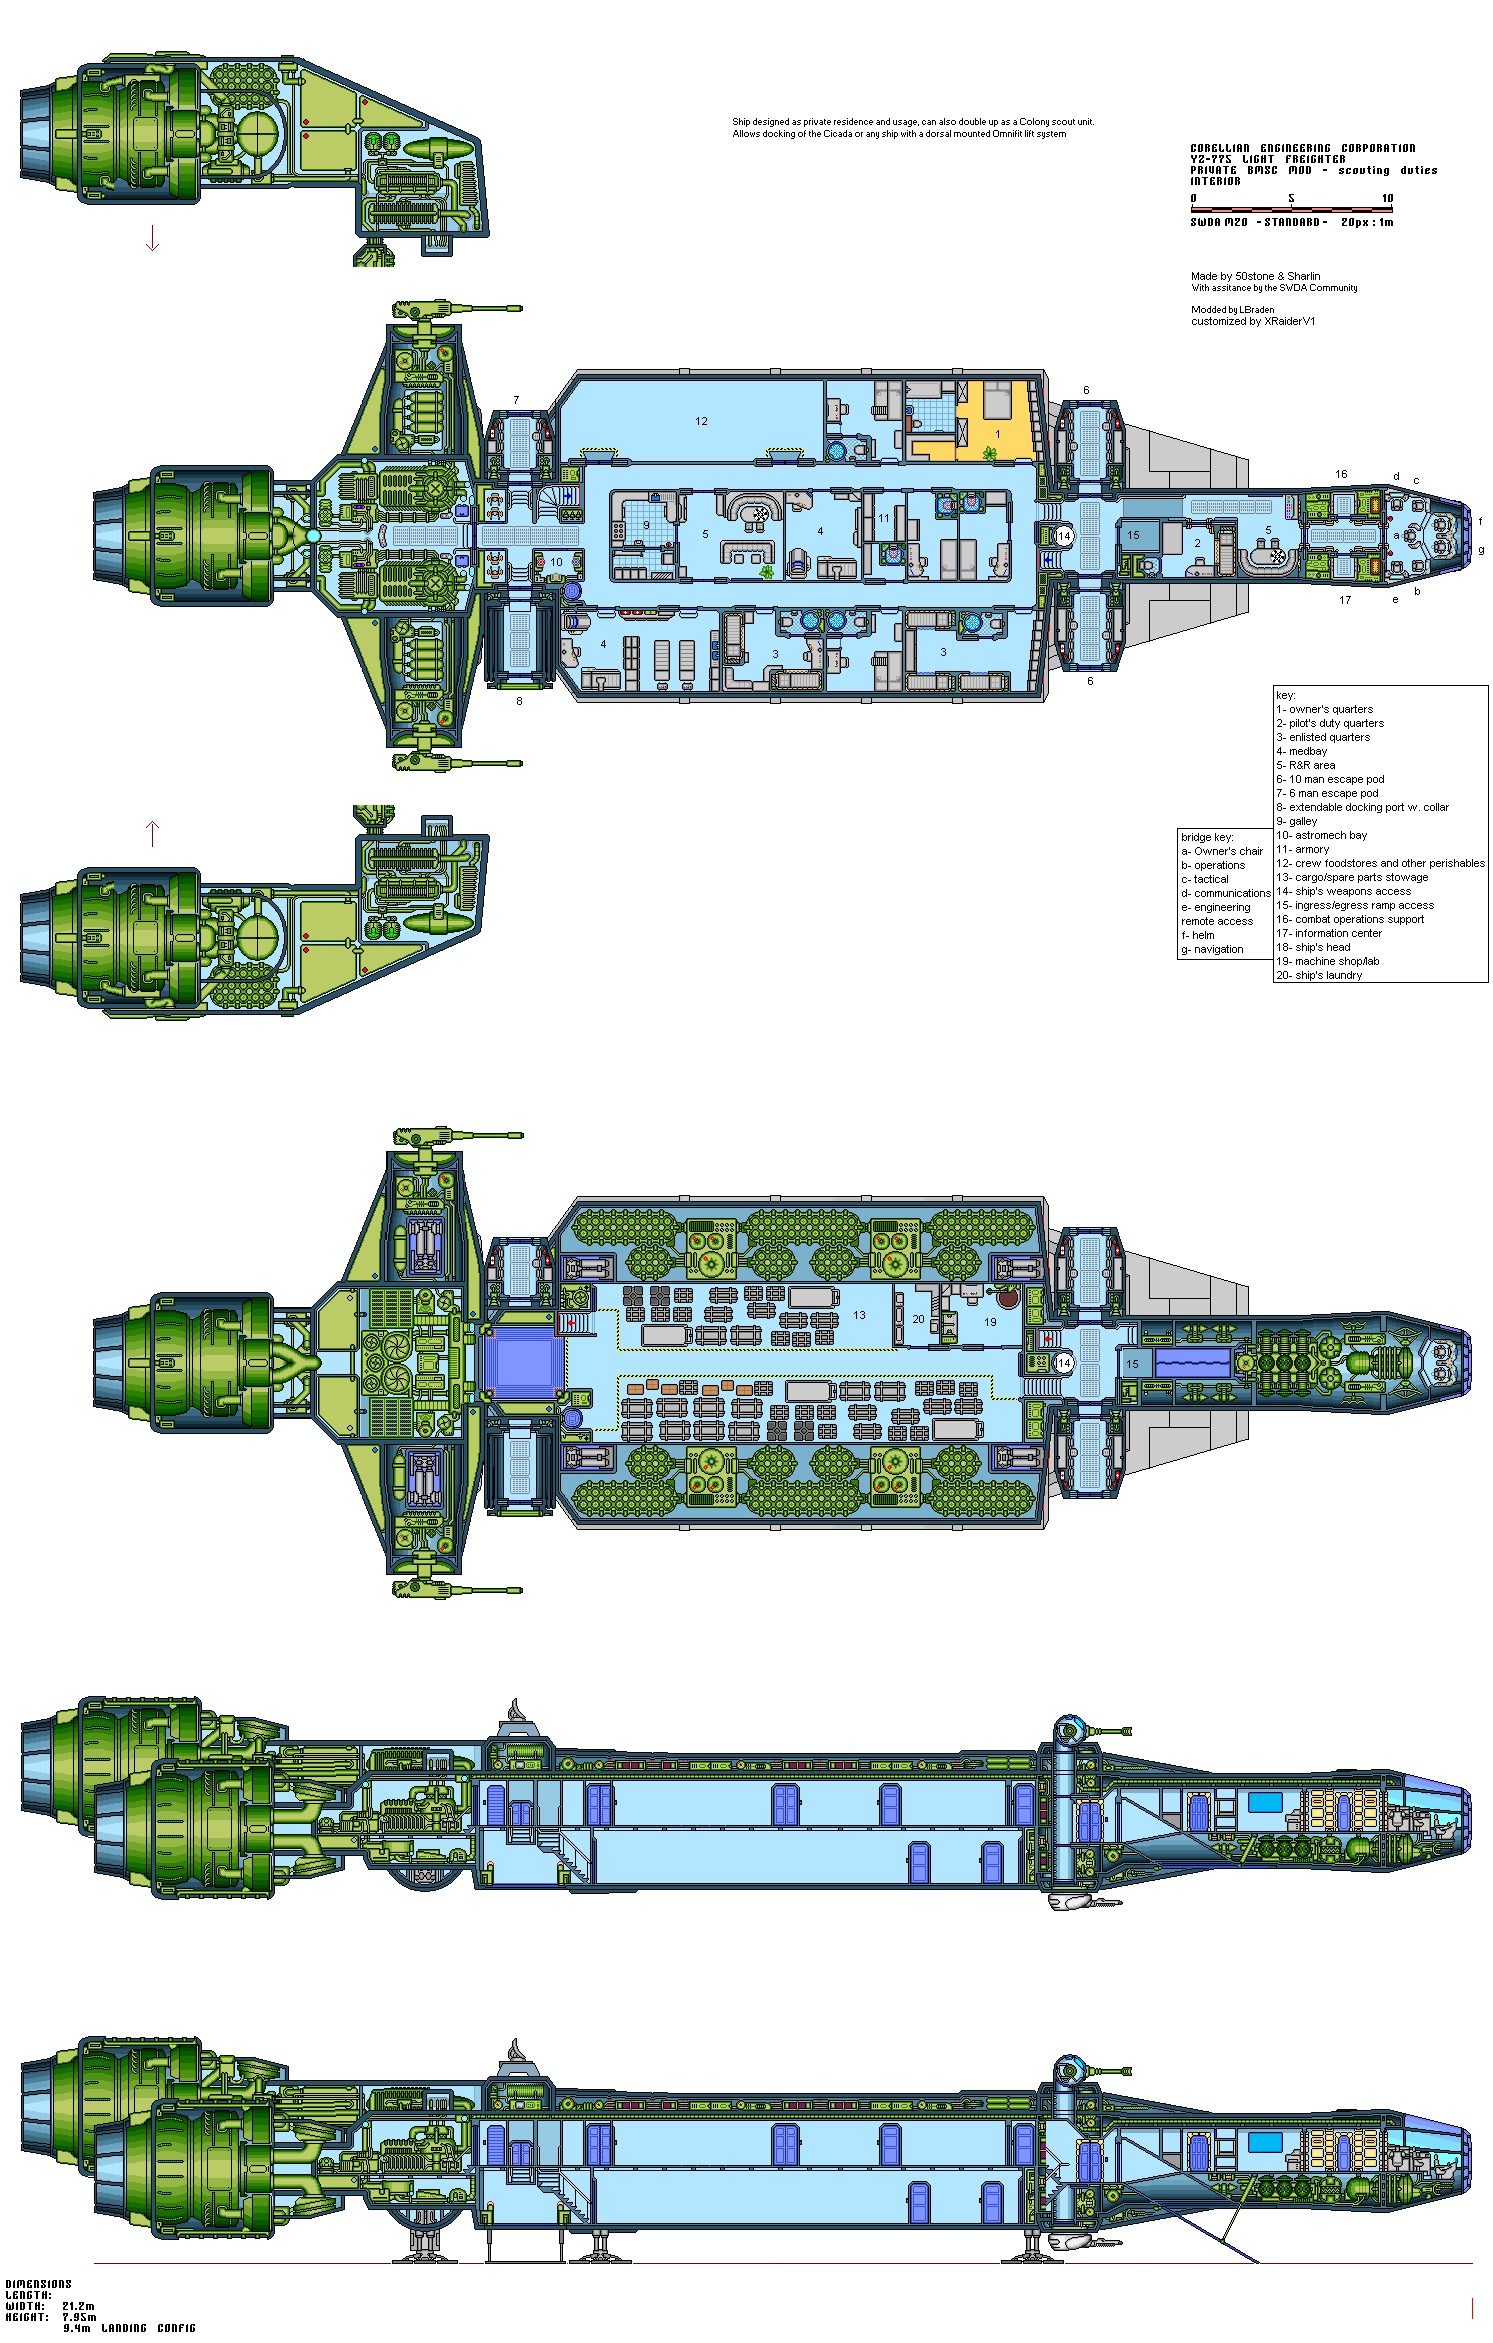 Star Wars Floor Plans Yz 775 A Silverhawk Internal By Xraiderv1 On Deviantart